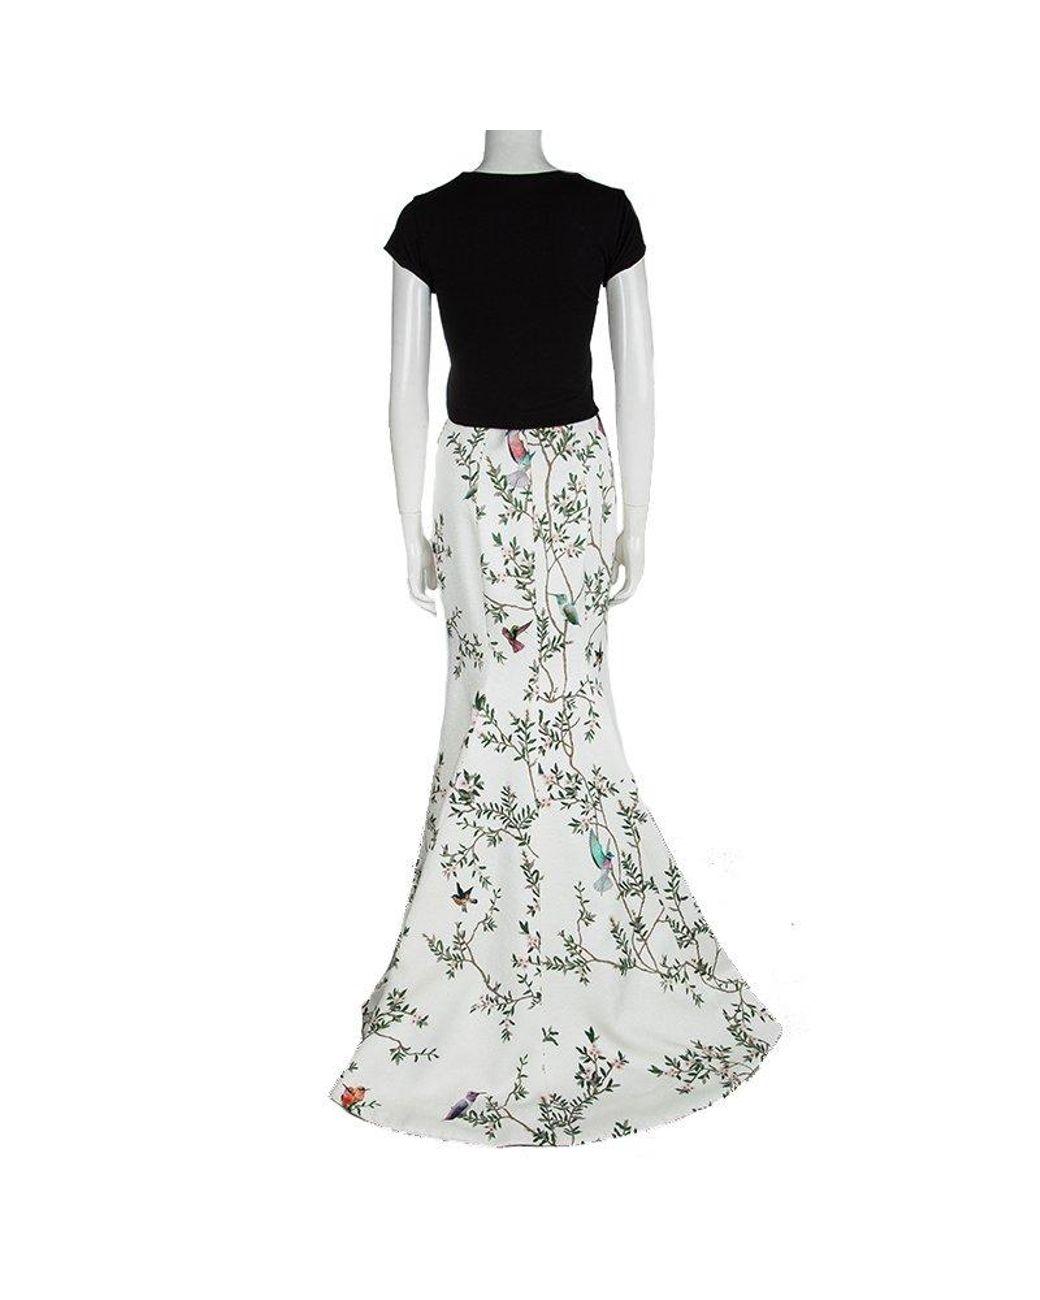 eb52e7b041d0d Monique Lhuillier Off White Pebble Jacquard Printed High Waist Maxi Skirt M  in White - Lyst